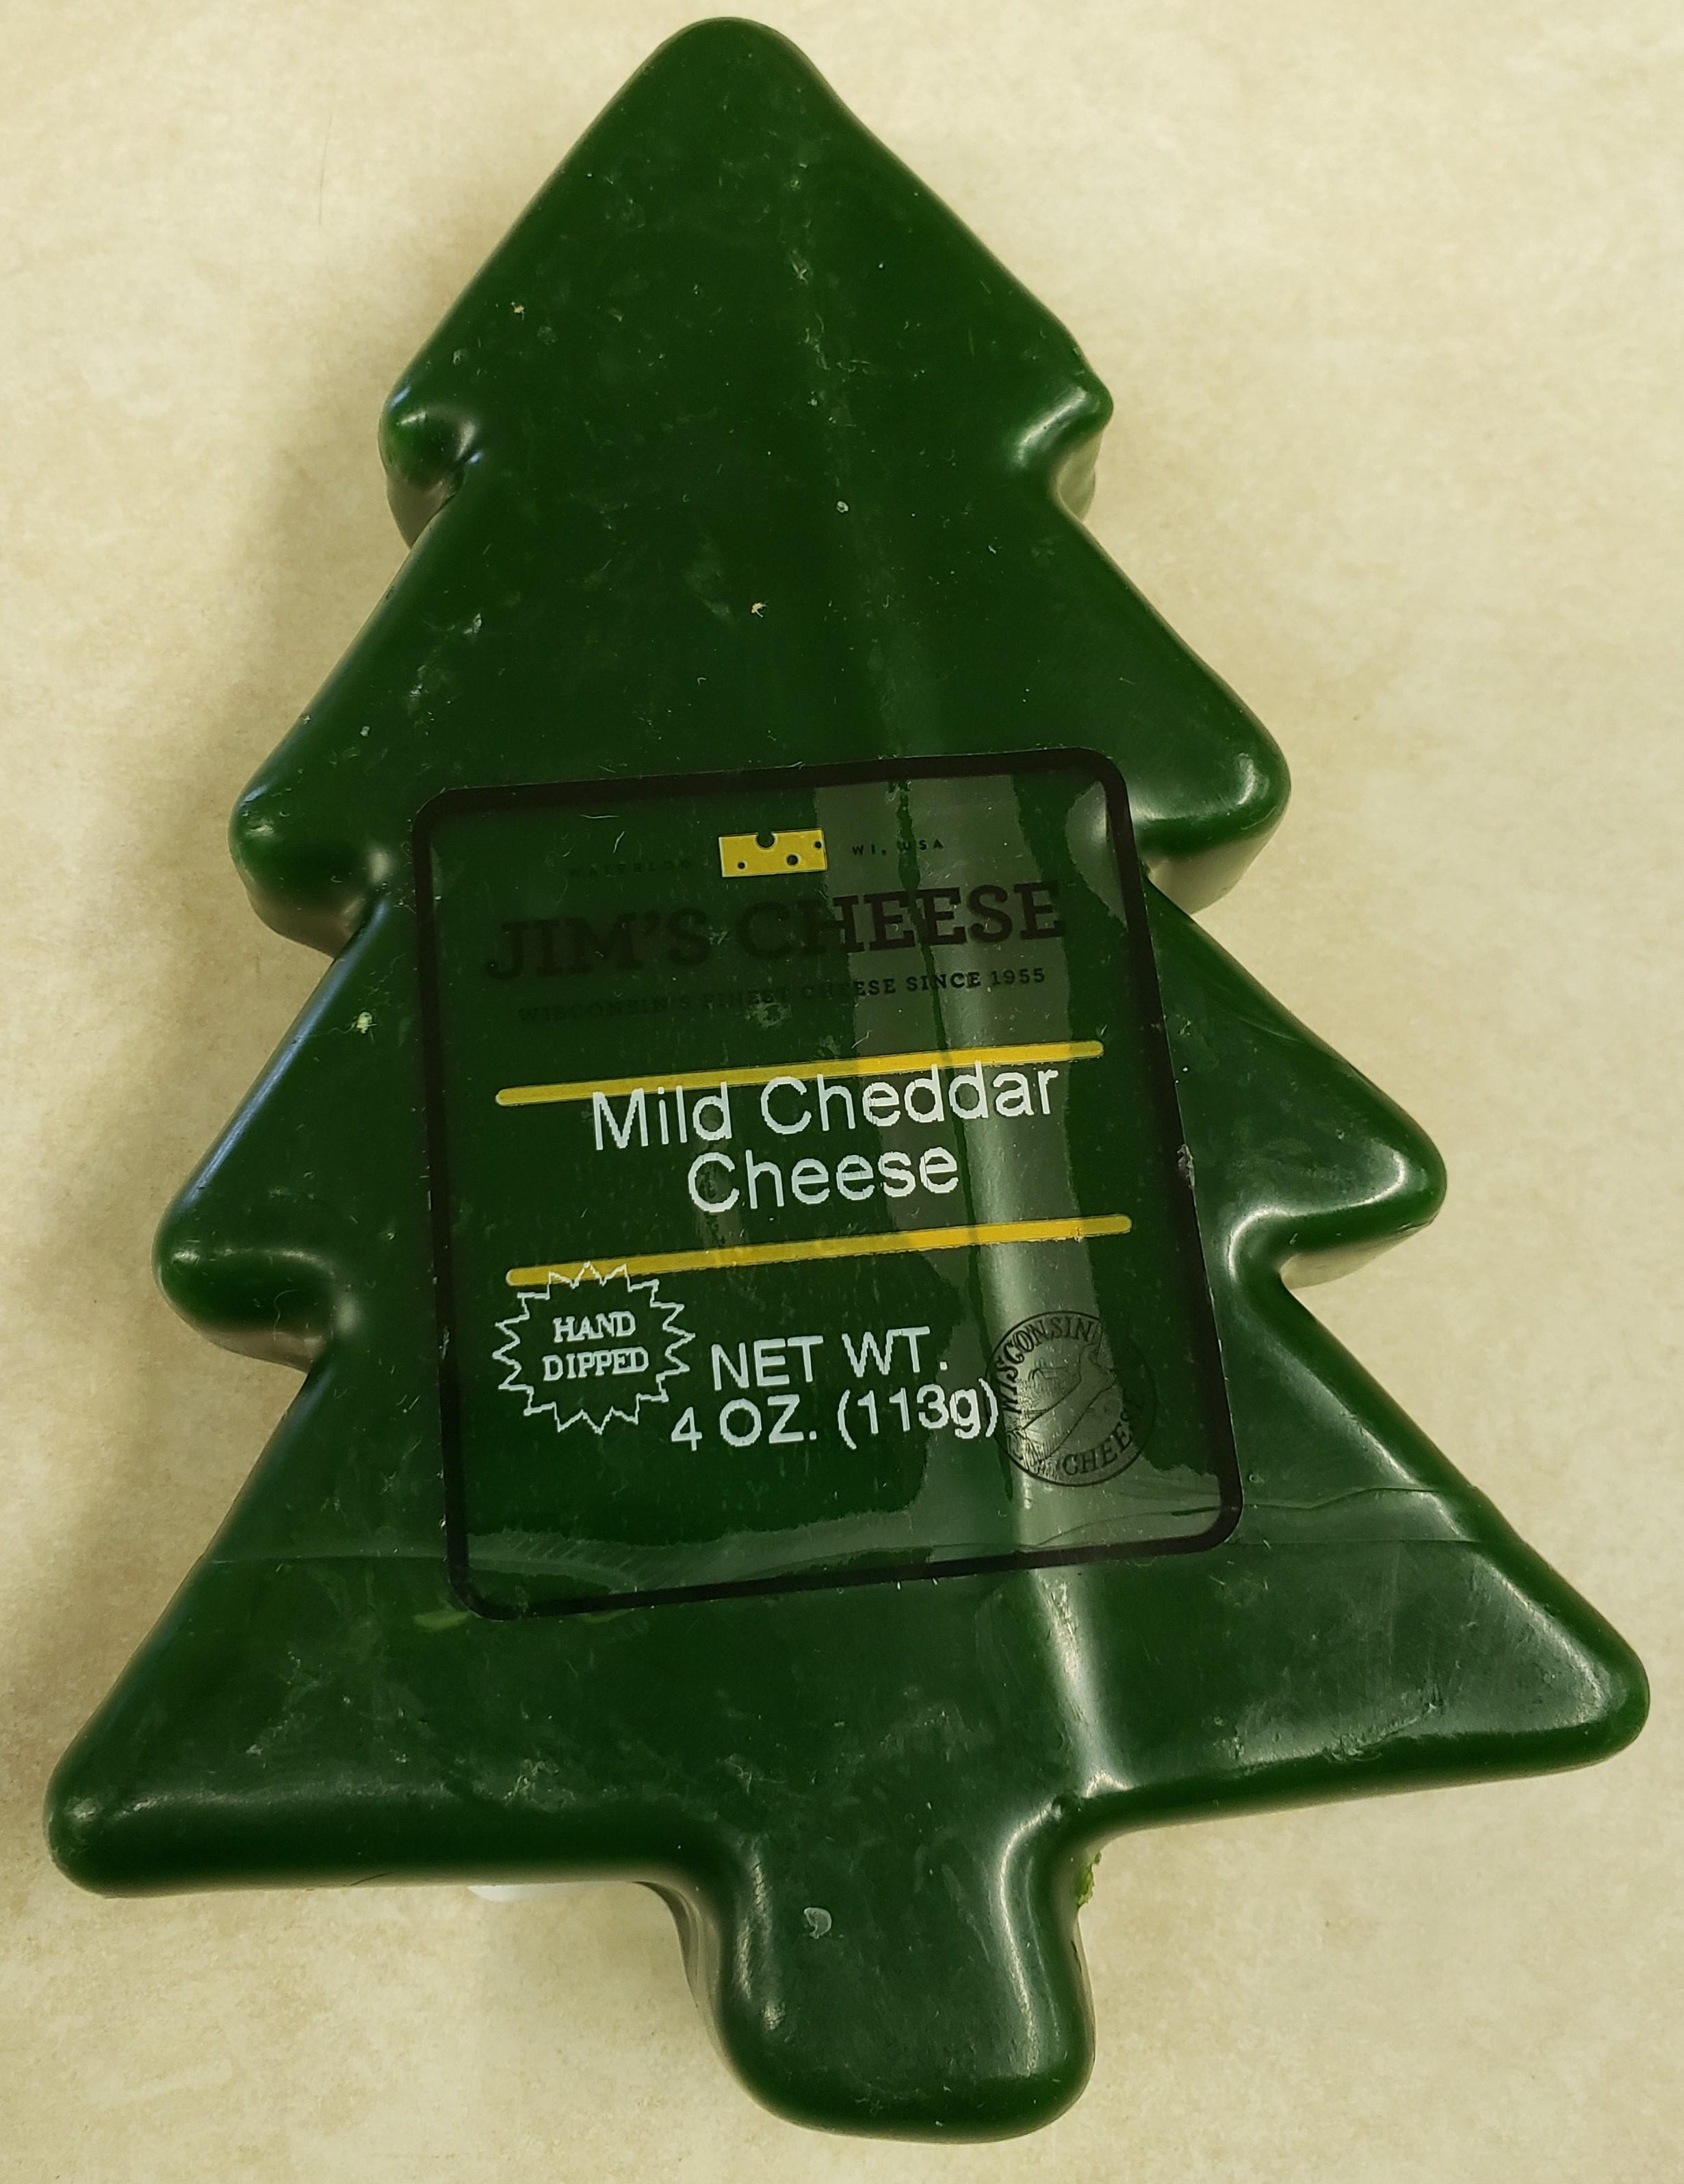 Wax Christmas Tree